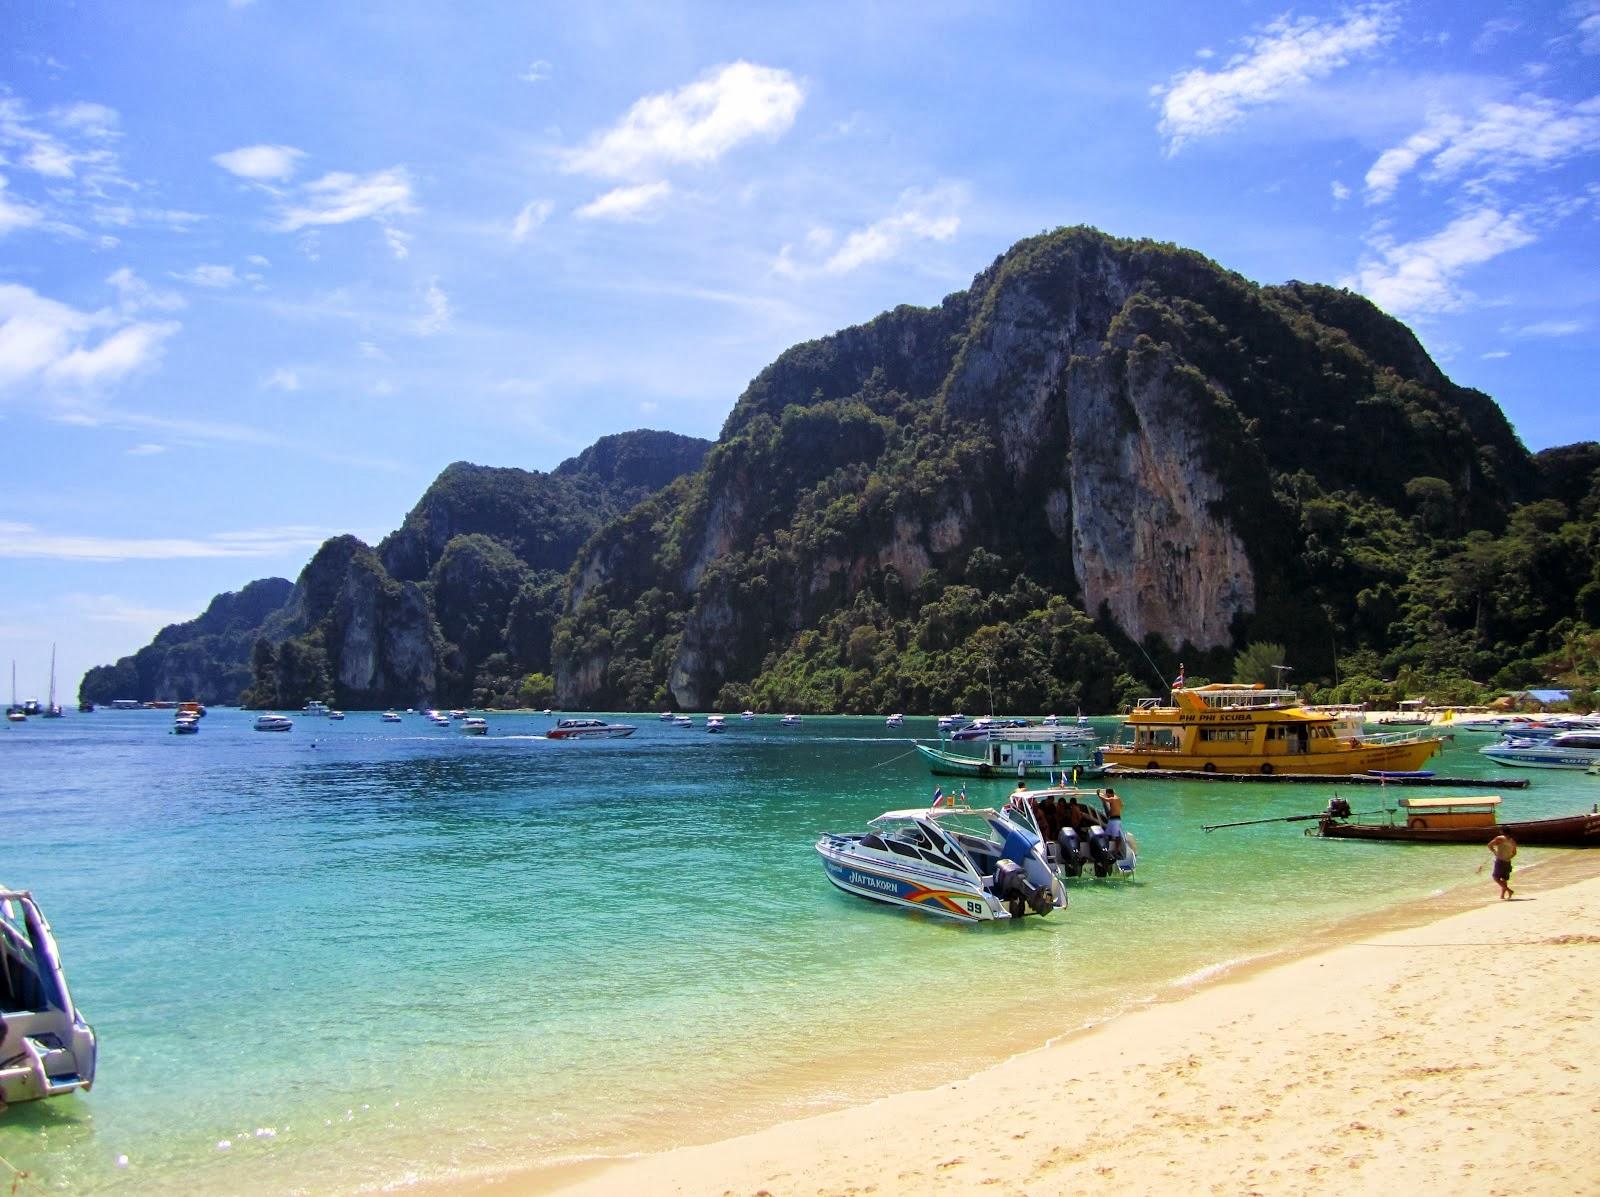 Koh phi phi island,Thailand  Wallpaper view